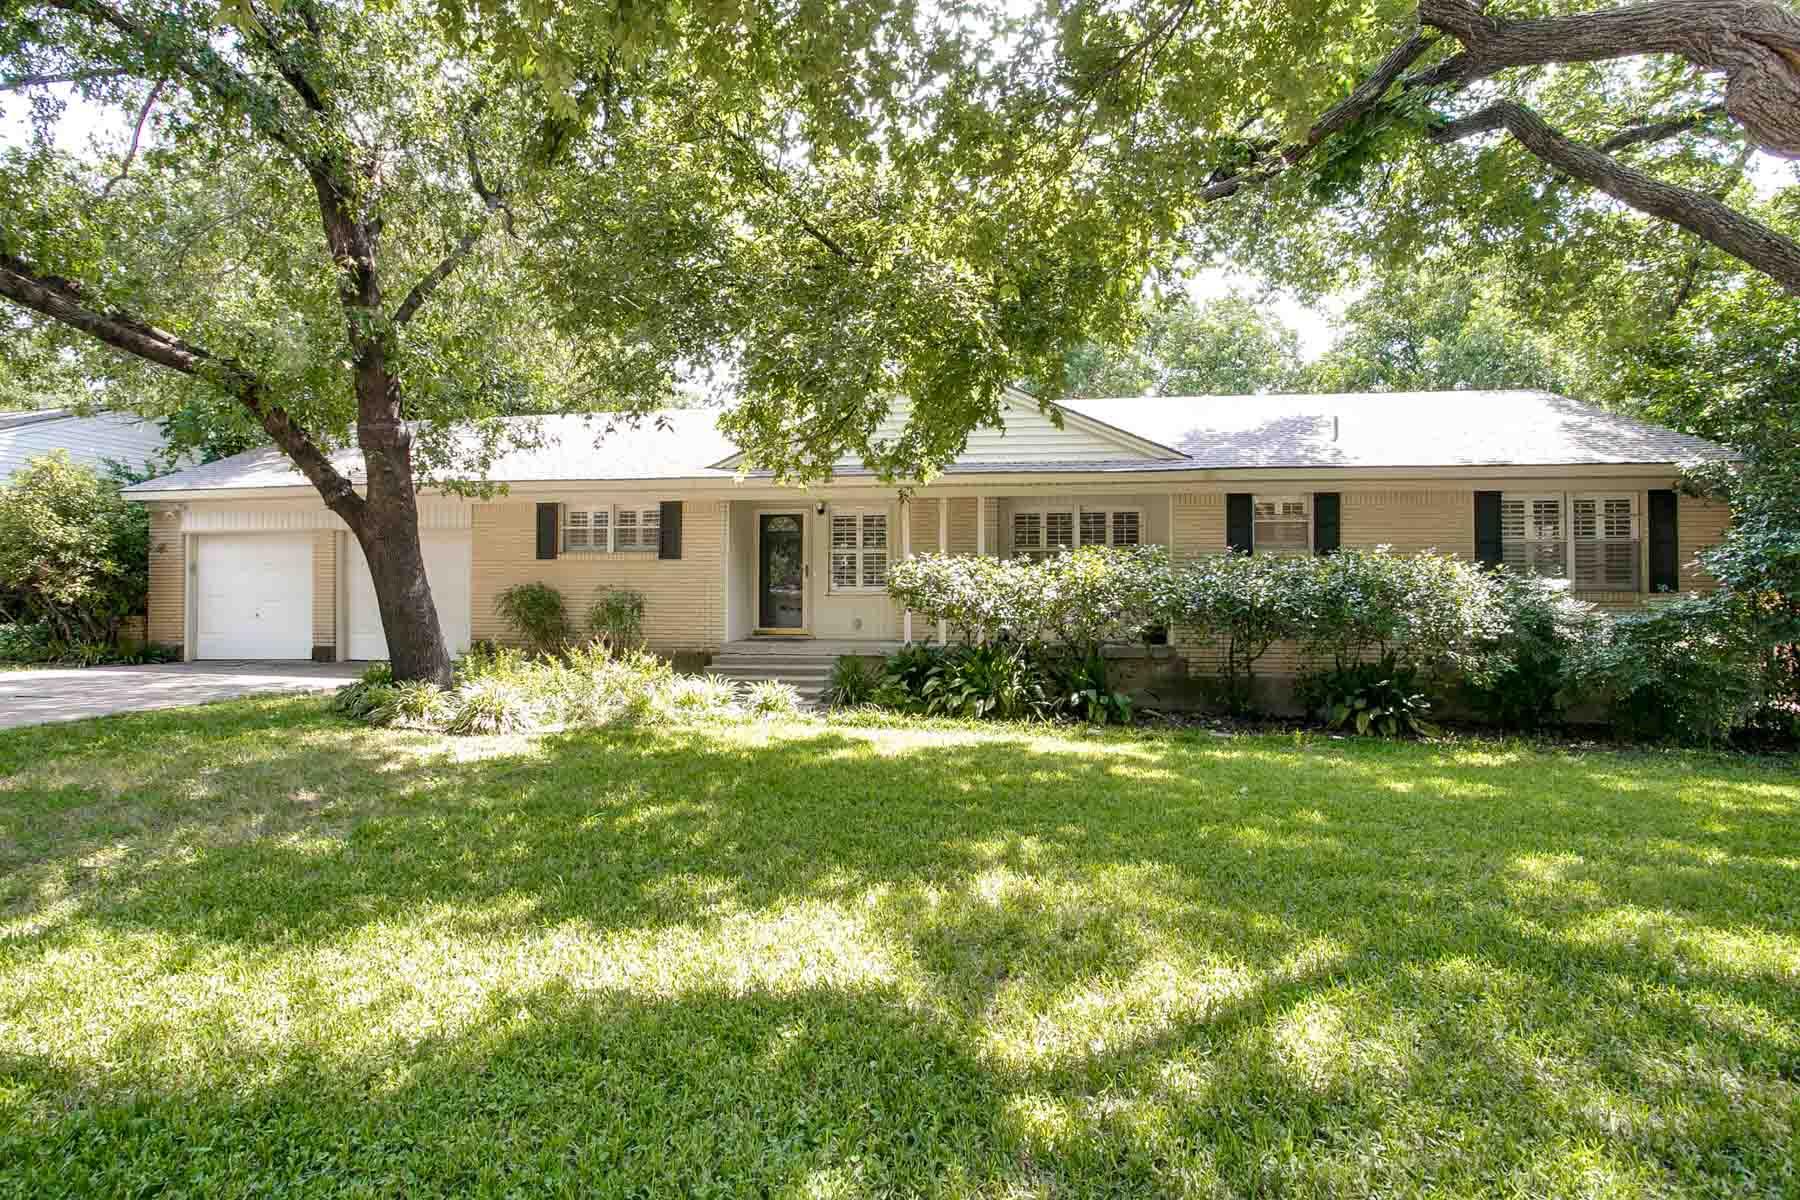 獨棟家庭住宅 為 出售 在 Ridglea Hills Classic 3929 Clayton Road West Fort Worth, 德克薩斯州, 76116 美國